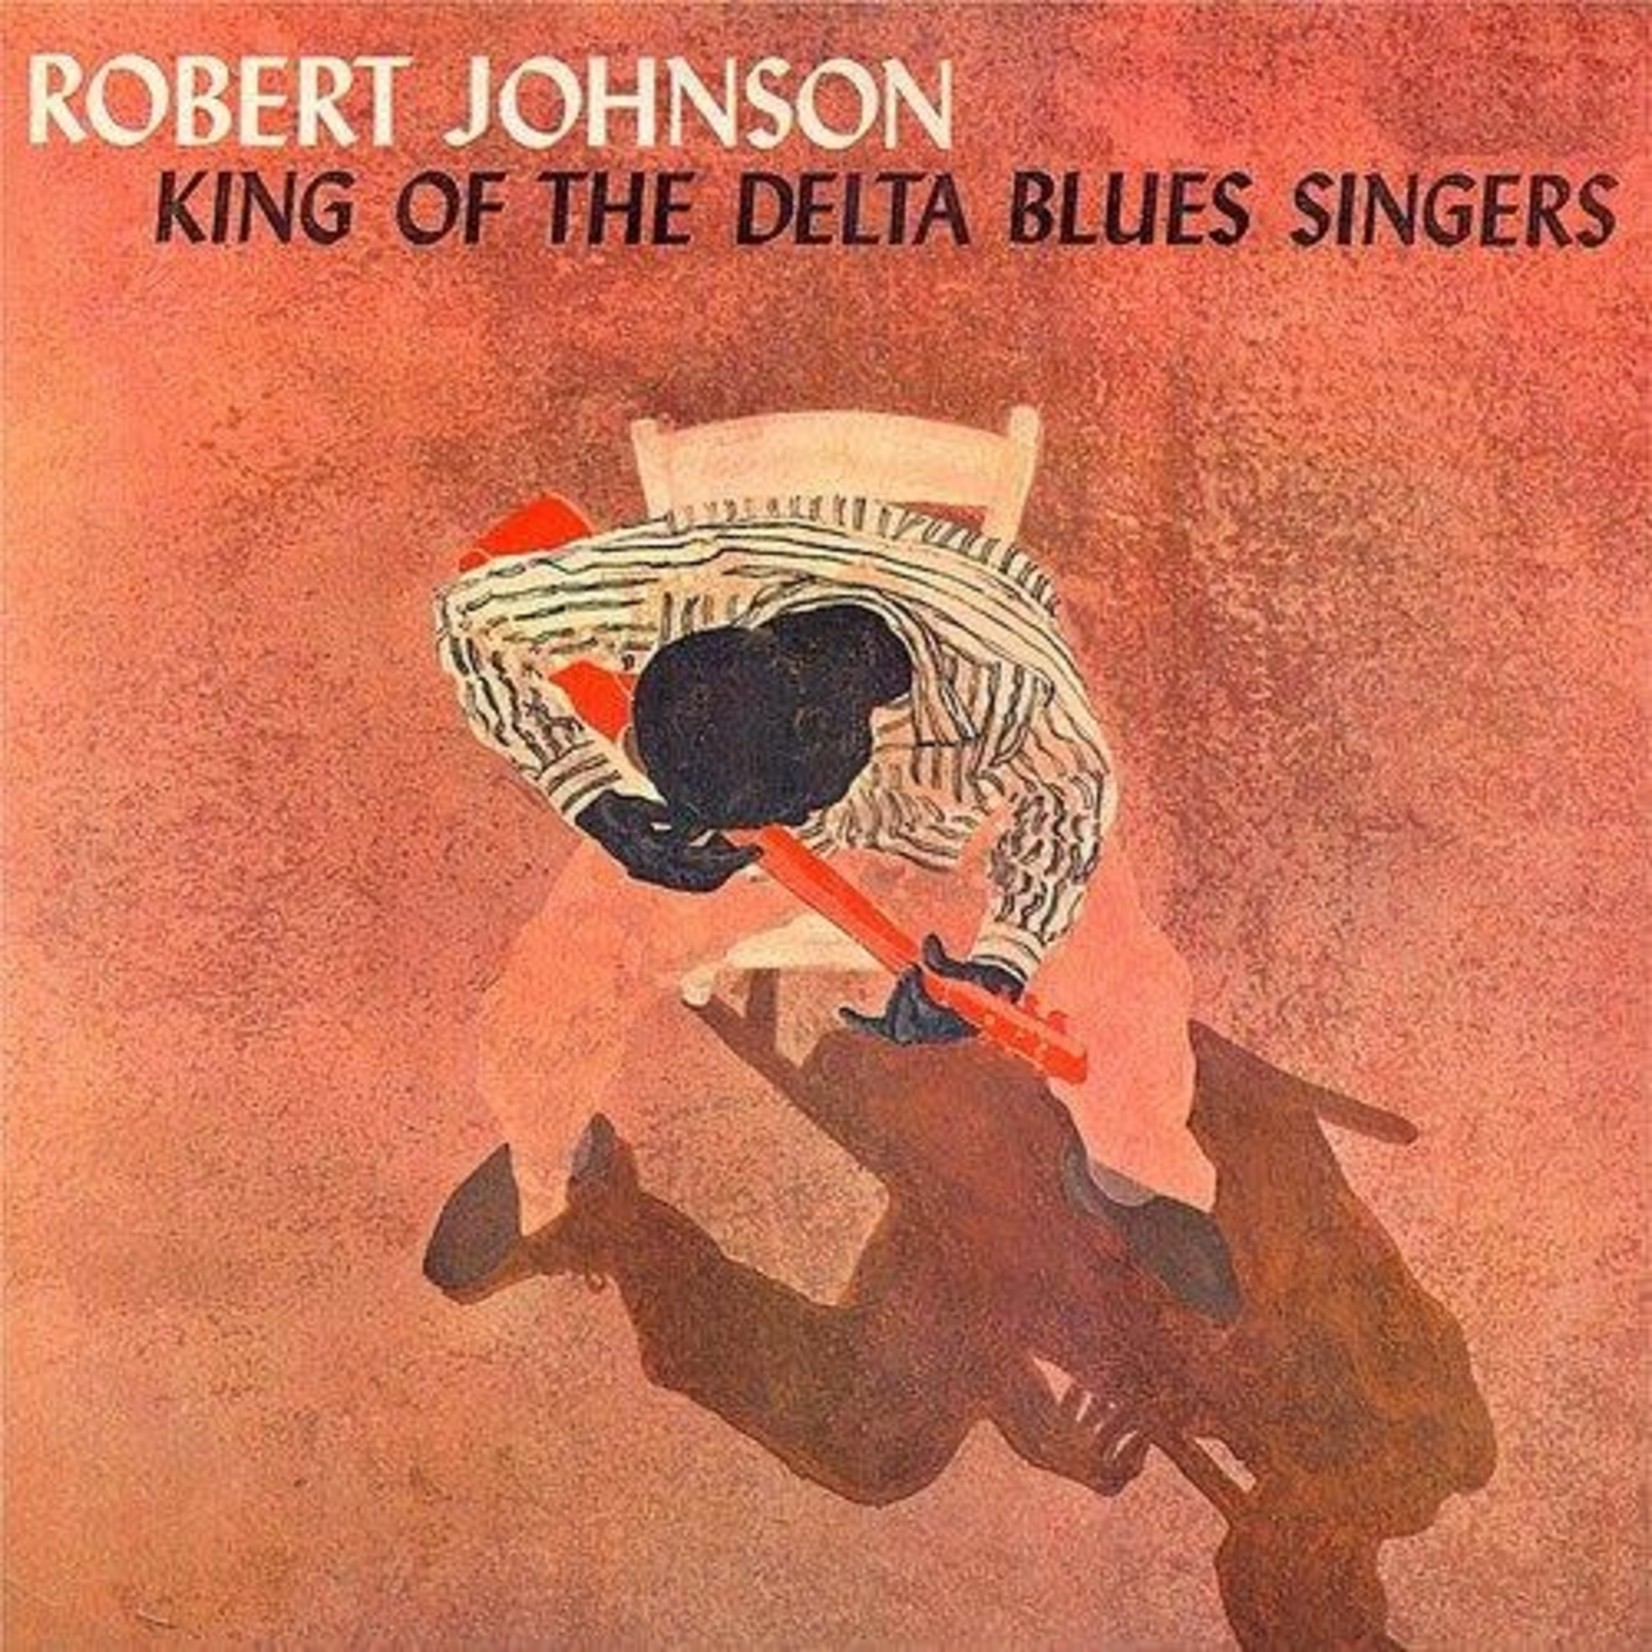 [New] Johnson, Robert: King Of The Delta Blues Singers (turquoise vinyl)